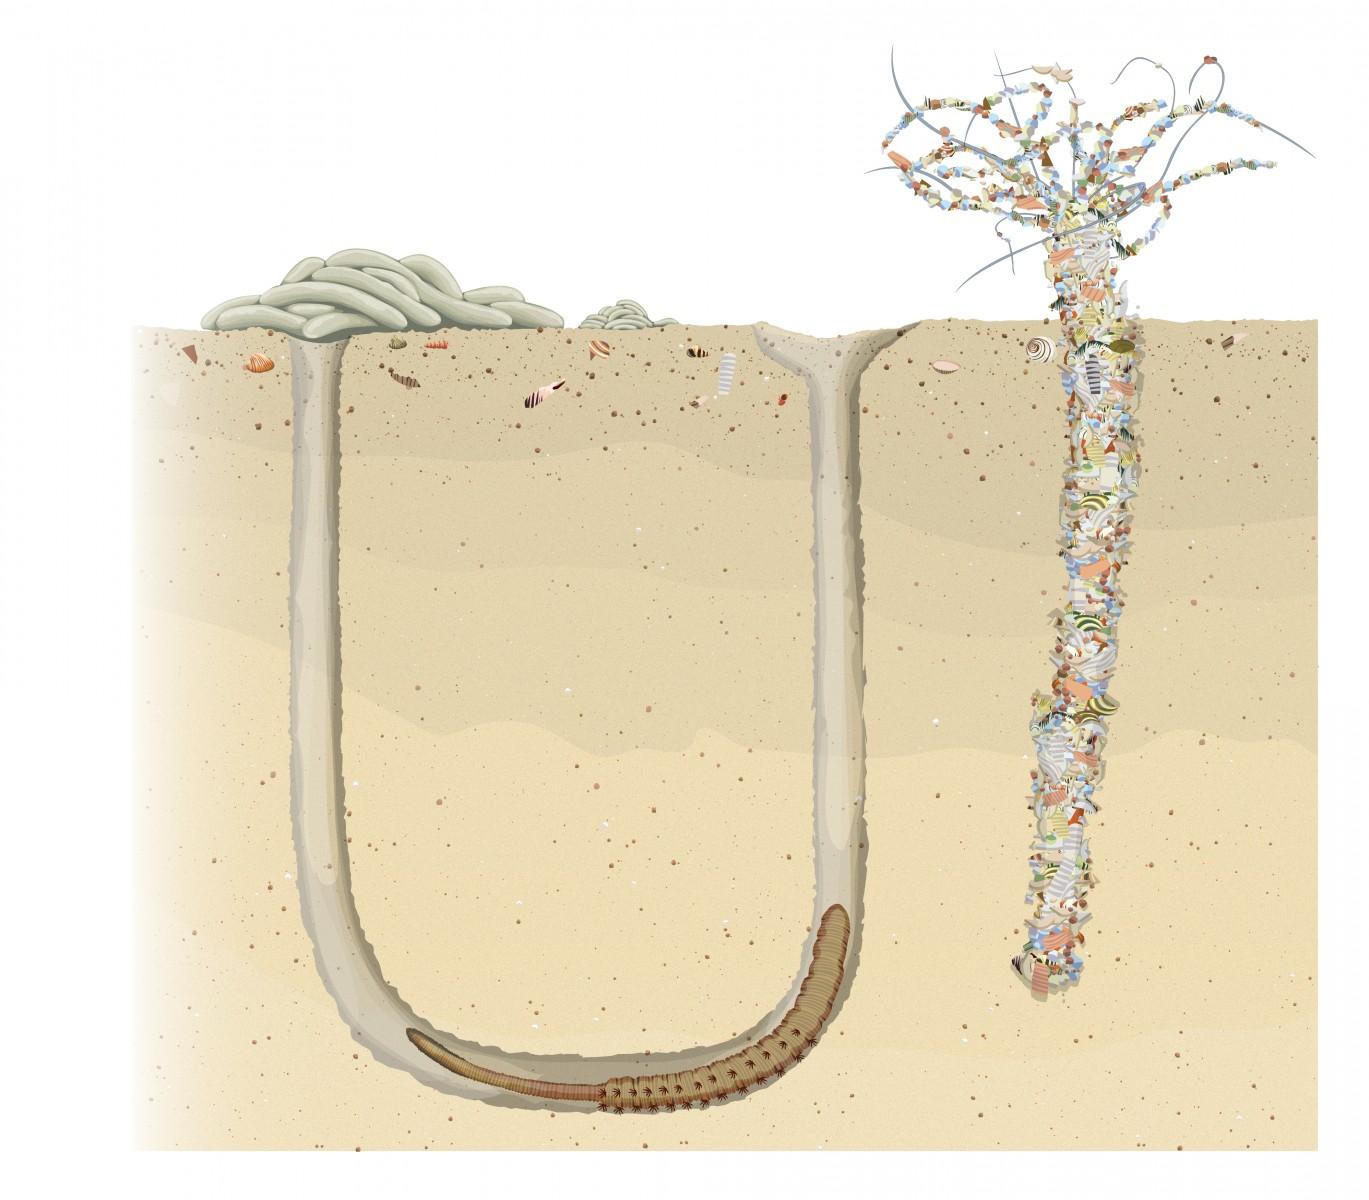 Dan Crisp Illustration